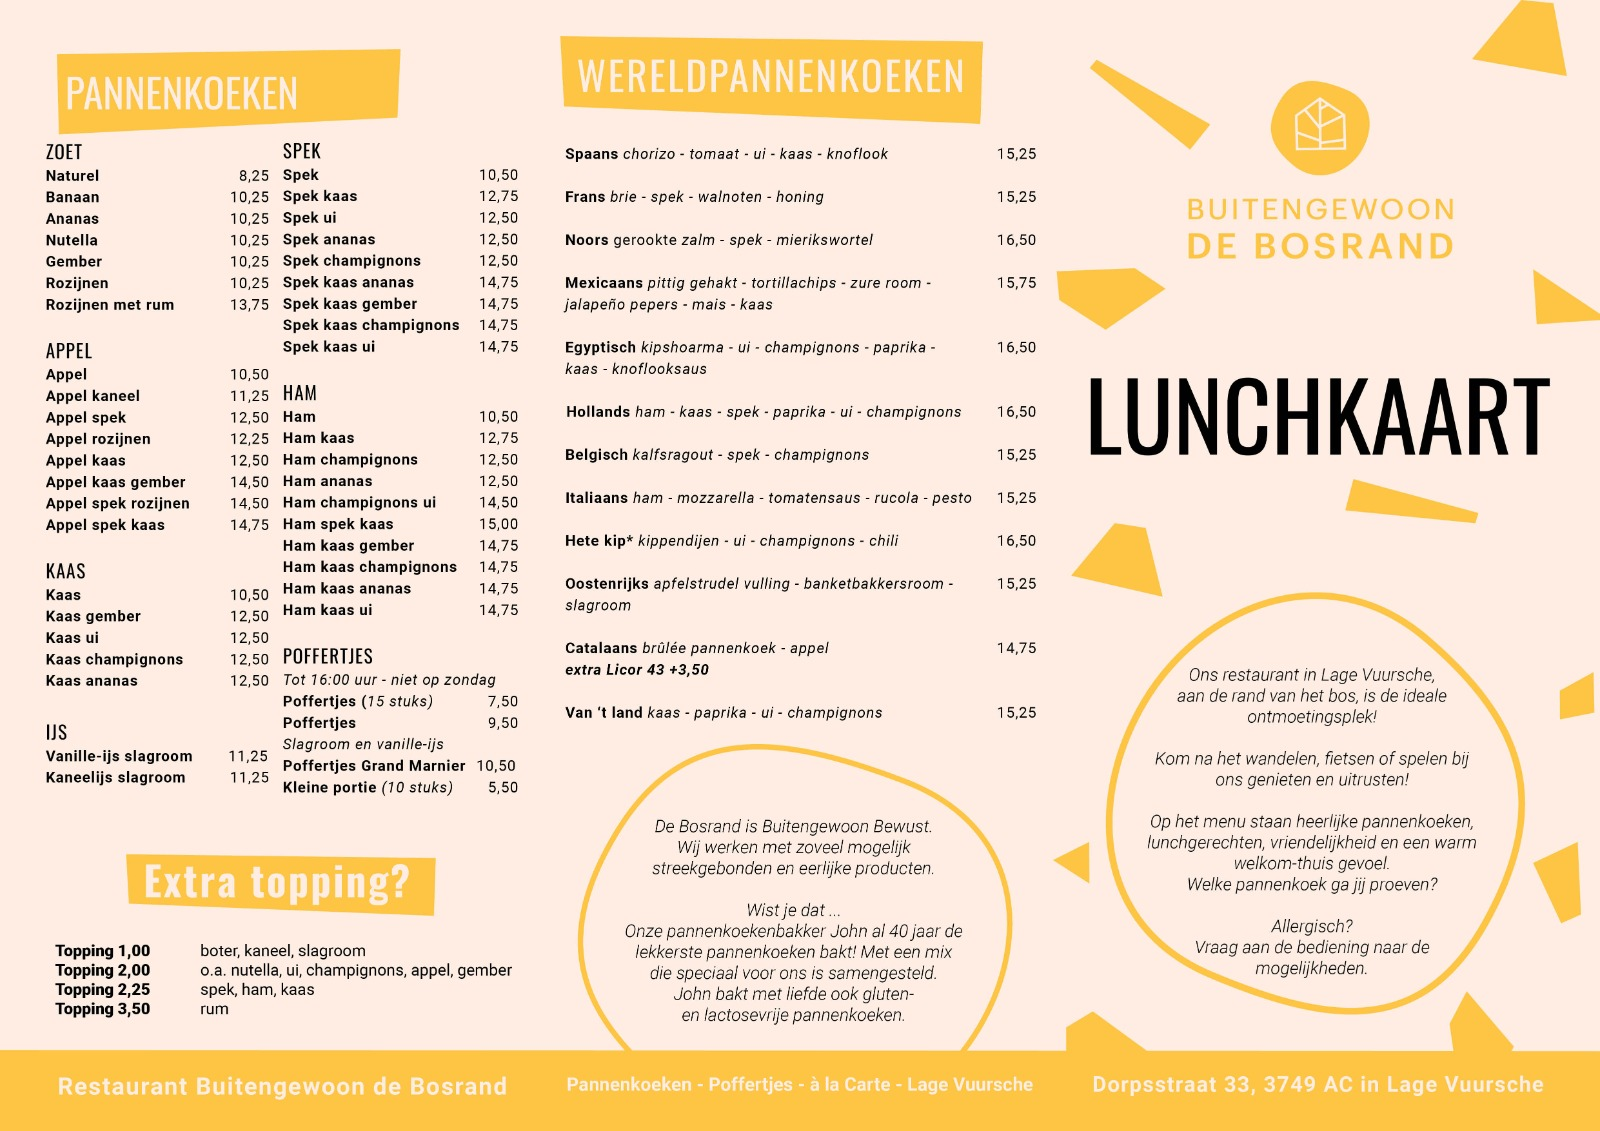 Lunchkaart restaurant De Bosrand Lage Vuursche